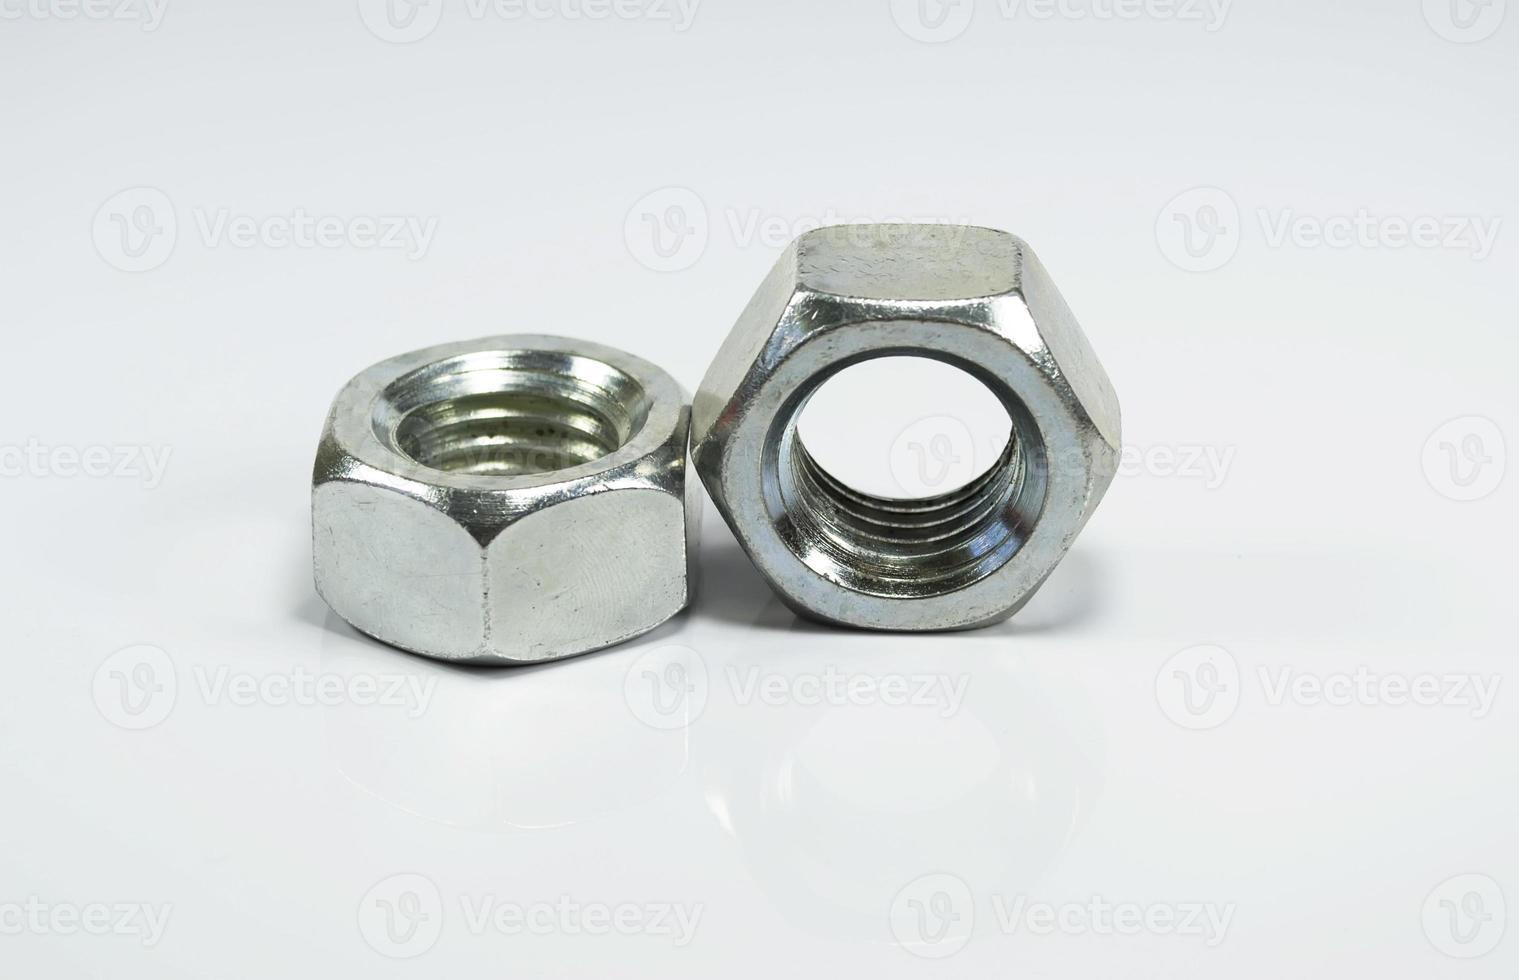 Two hexagonal nuts photo